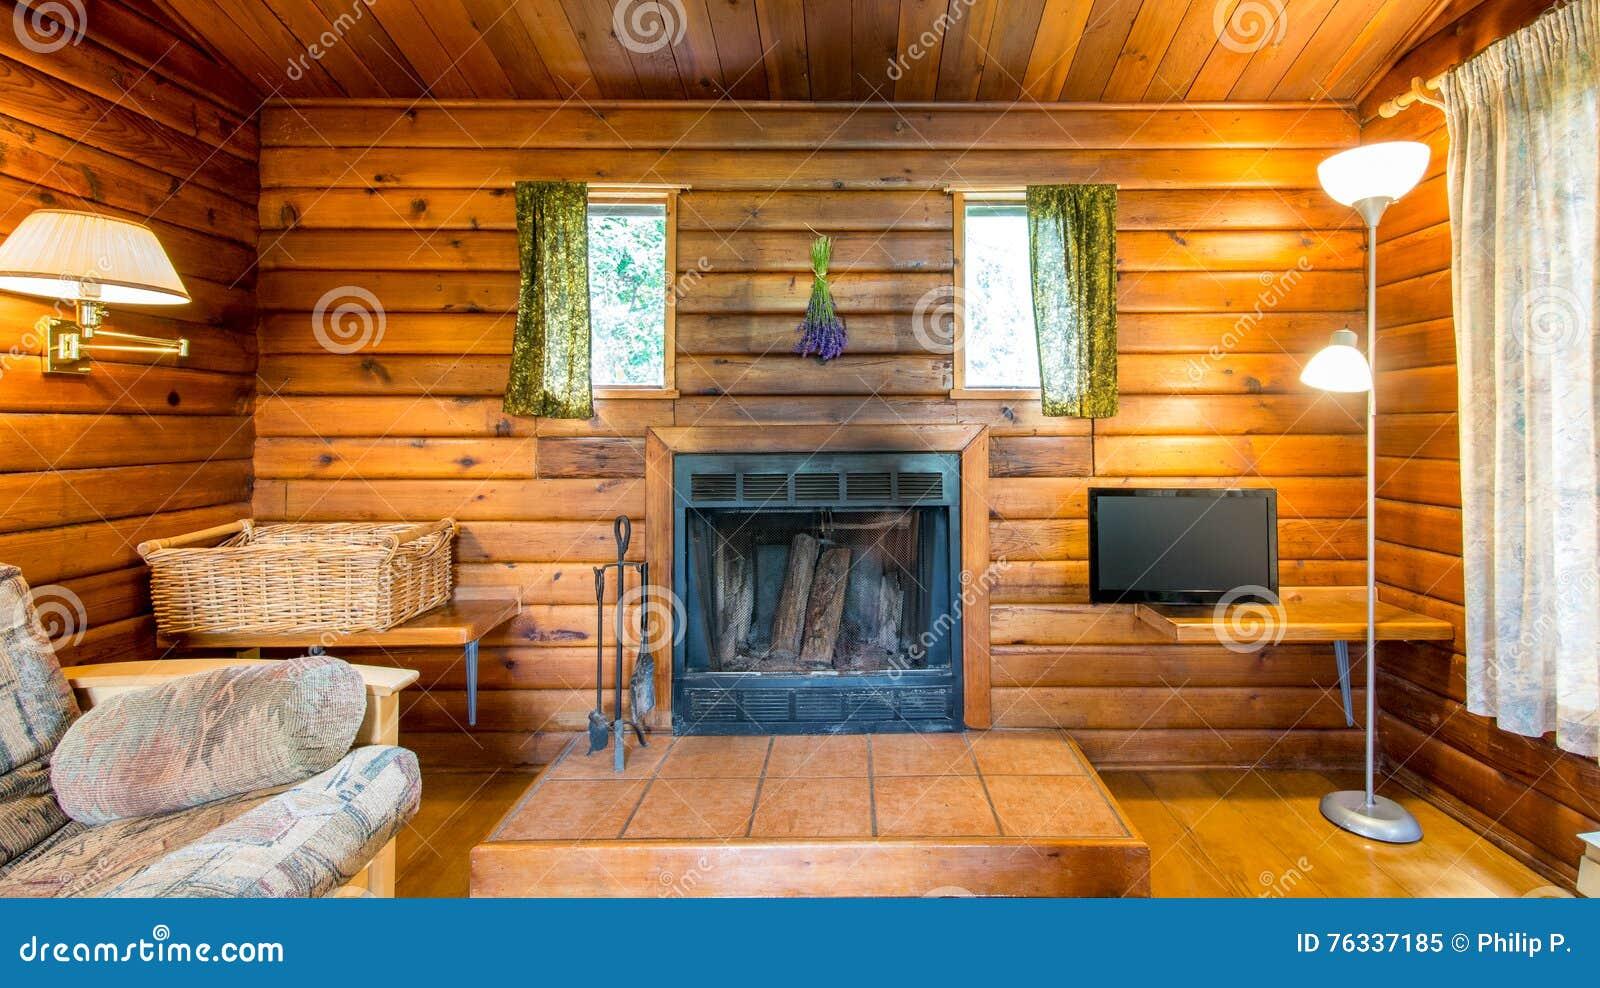 Rustic cabin autumn colors cumberland gap national park for Rustic cabin